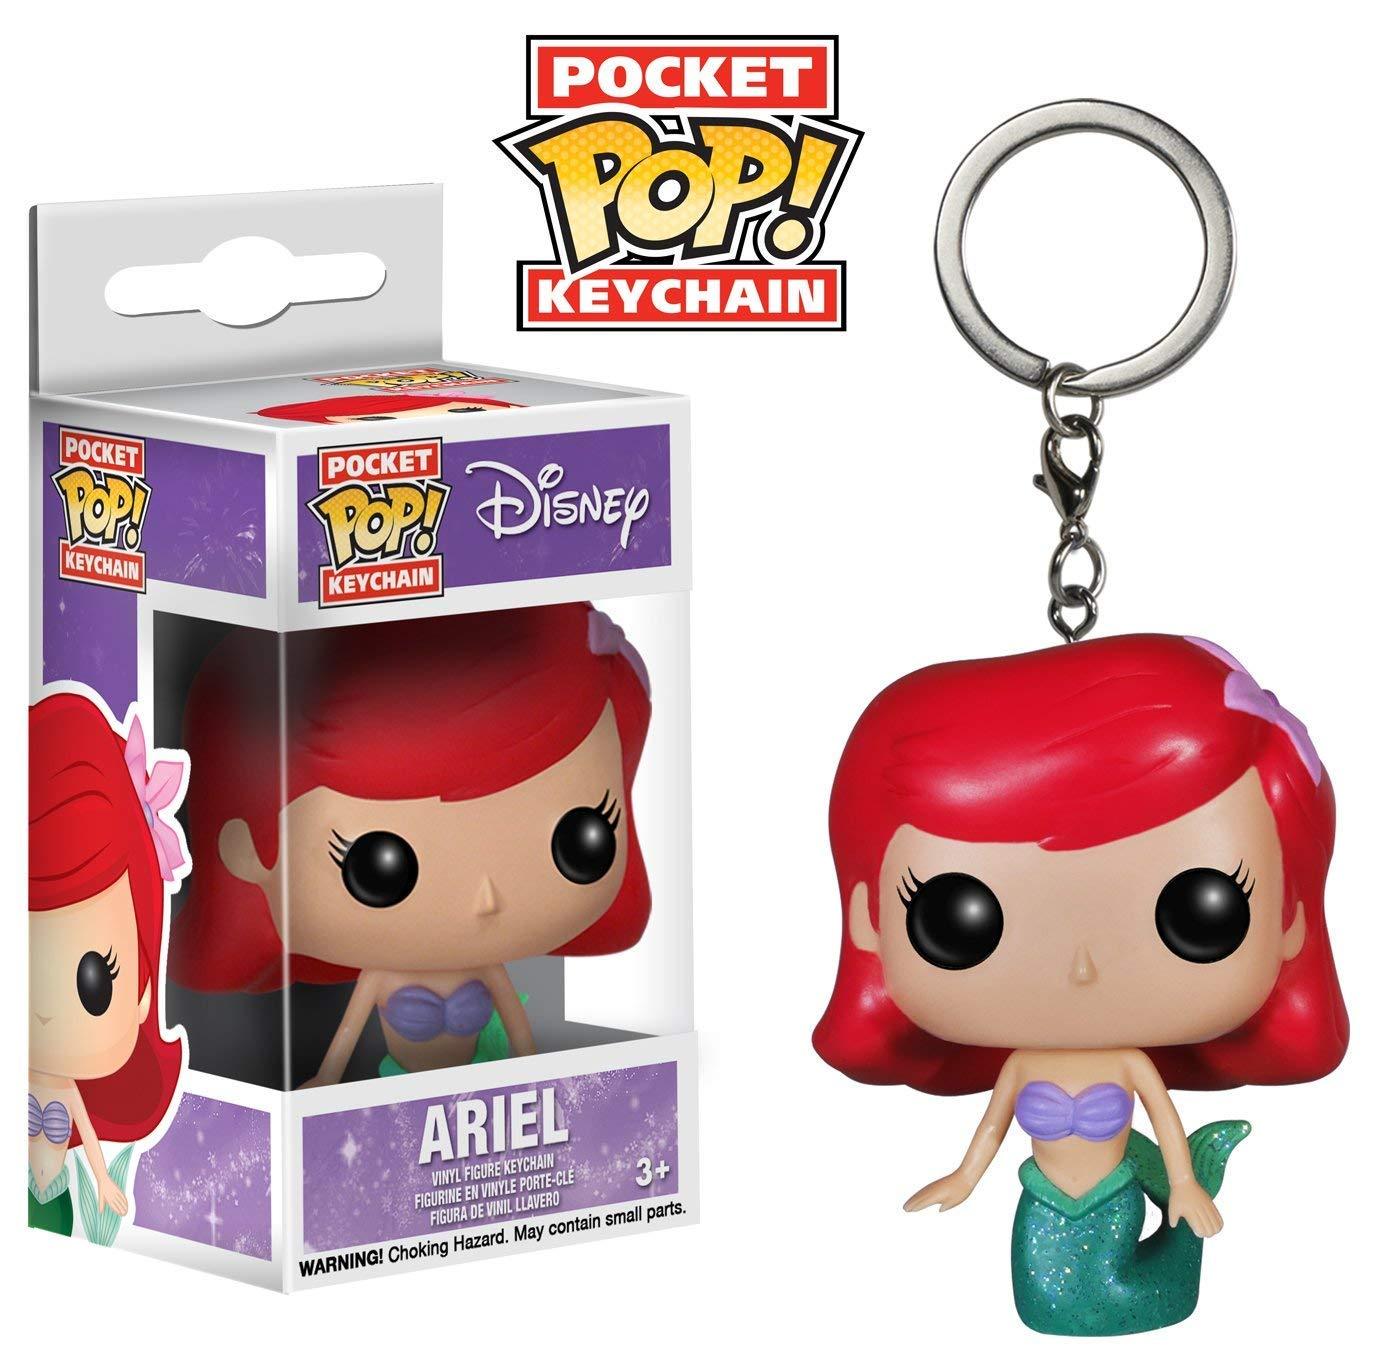 JPTACTICAL Ariel Bobble Head Action Figures Keychain Mini Figure